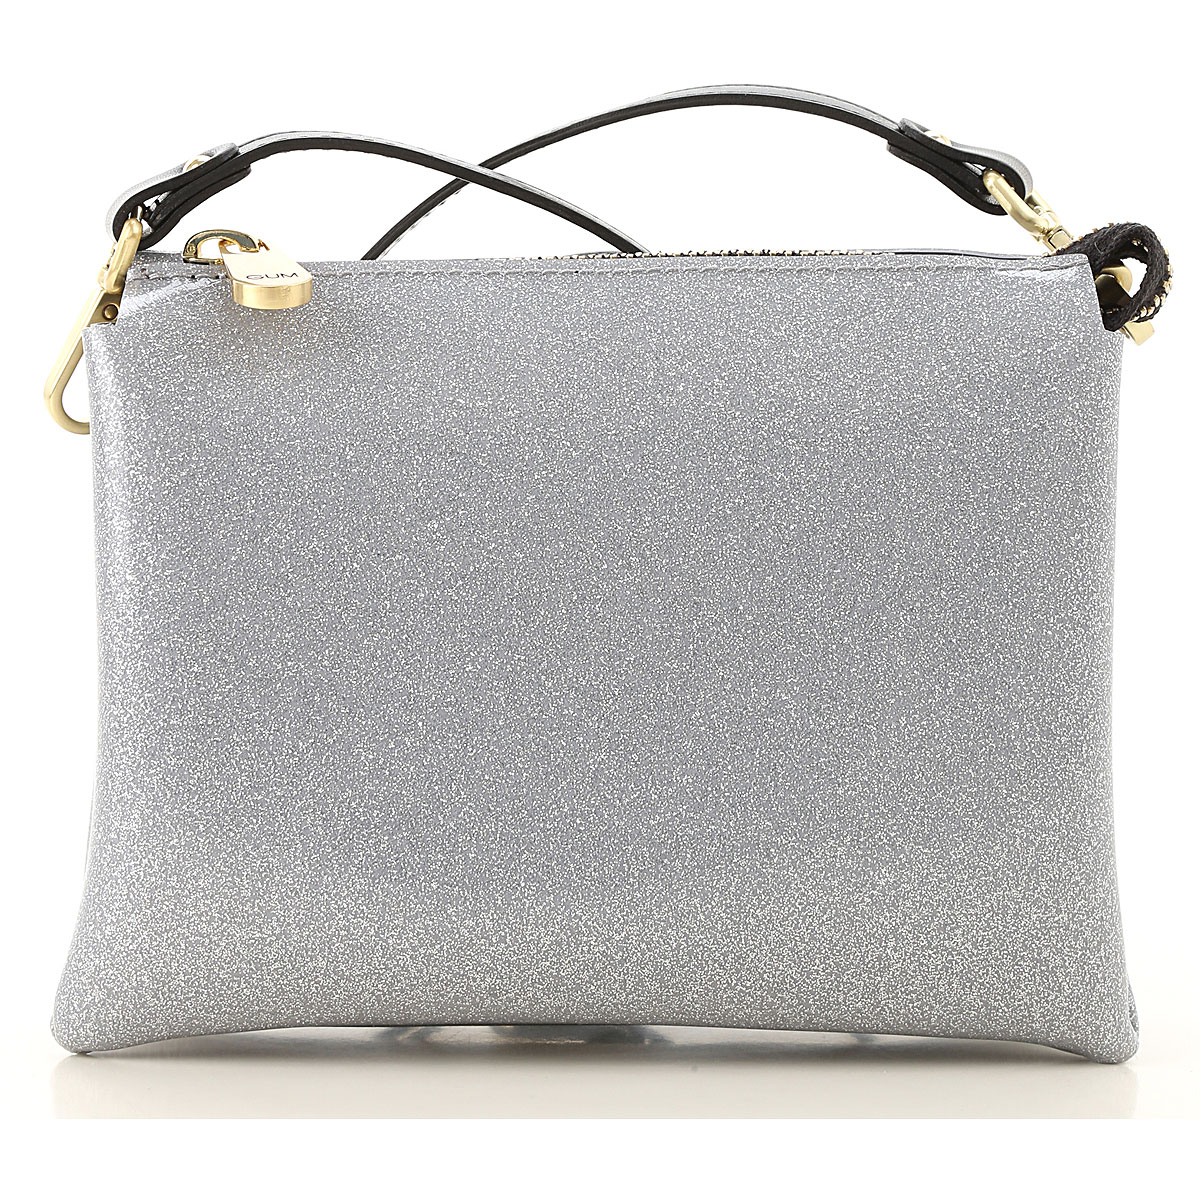 GUM Gianni Chiarini Design Shoulder Bag for Women On Sale, Silver, PVC, 2019